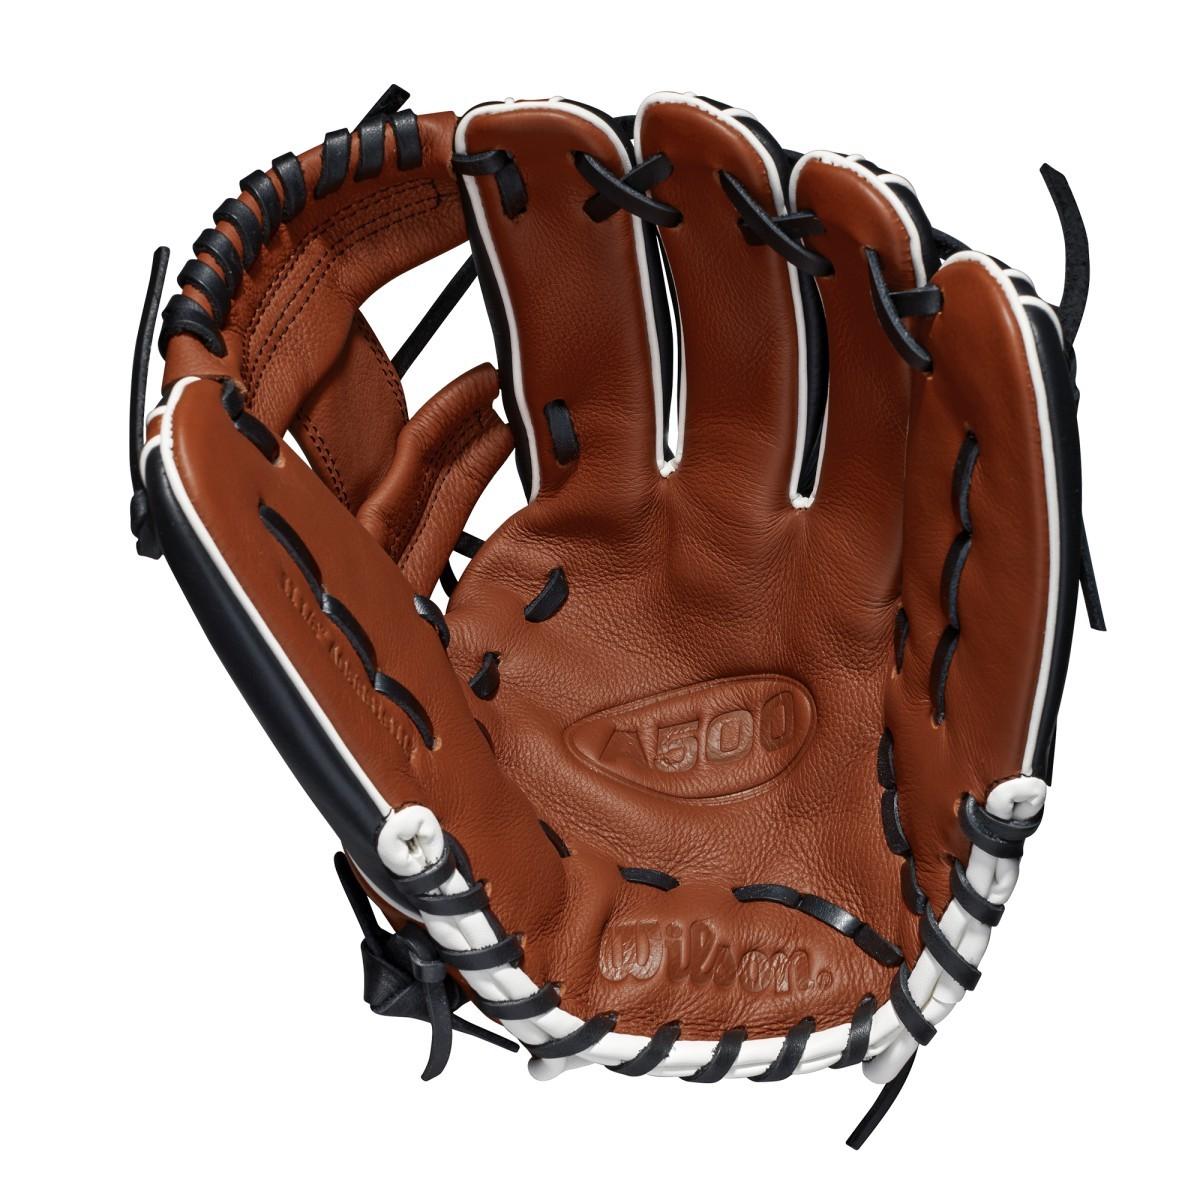 "Wilson A500 Series 11.5"" All-Position Glove"